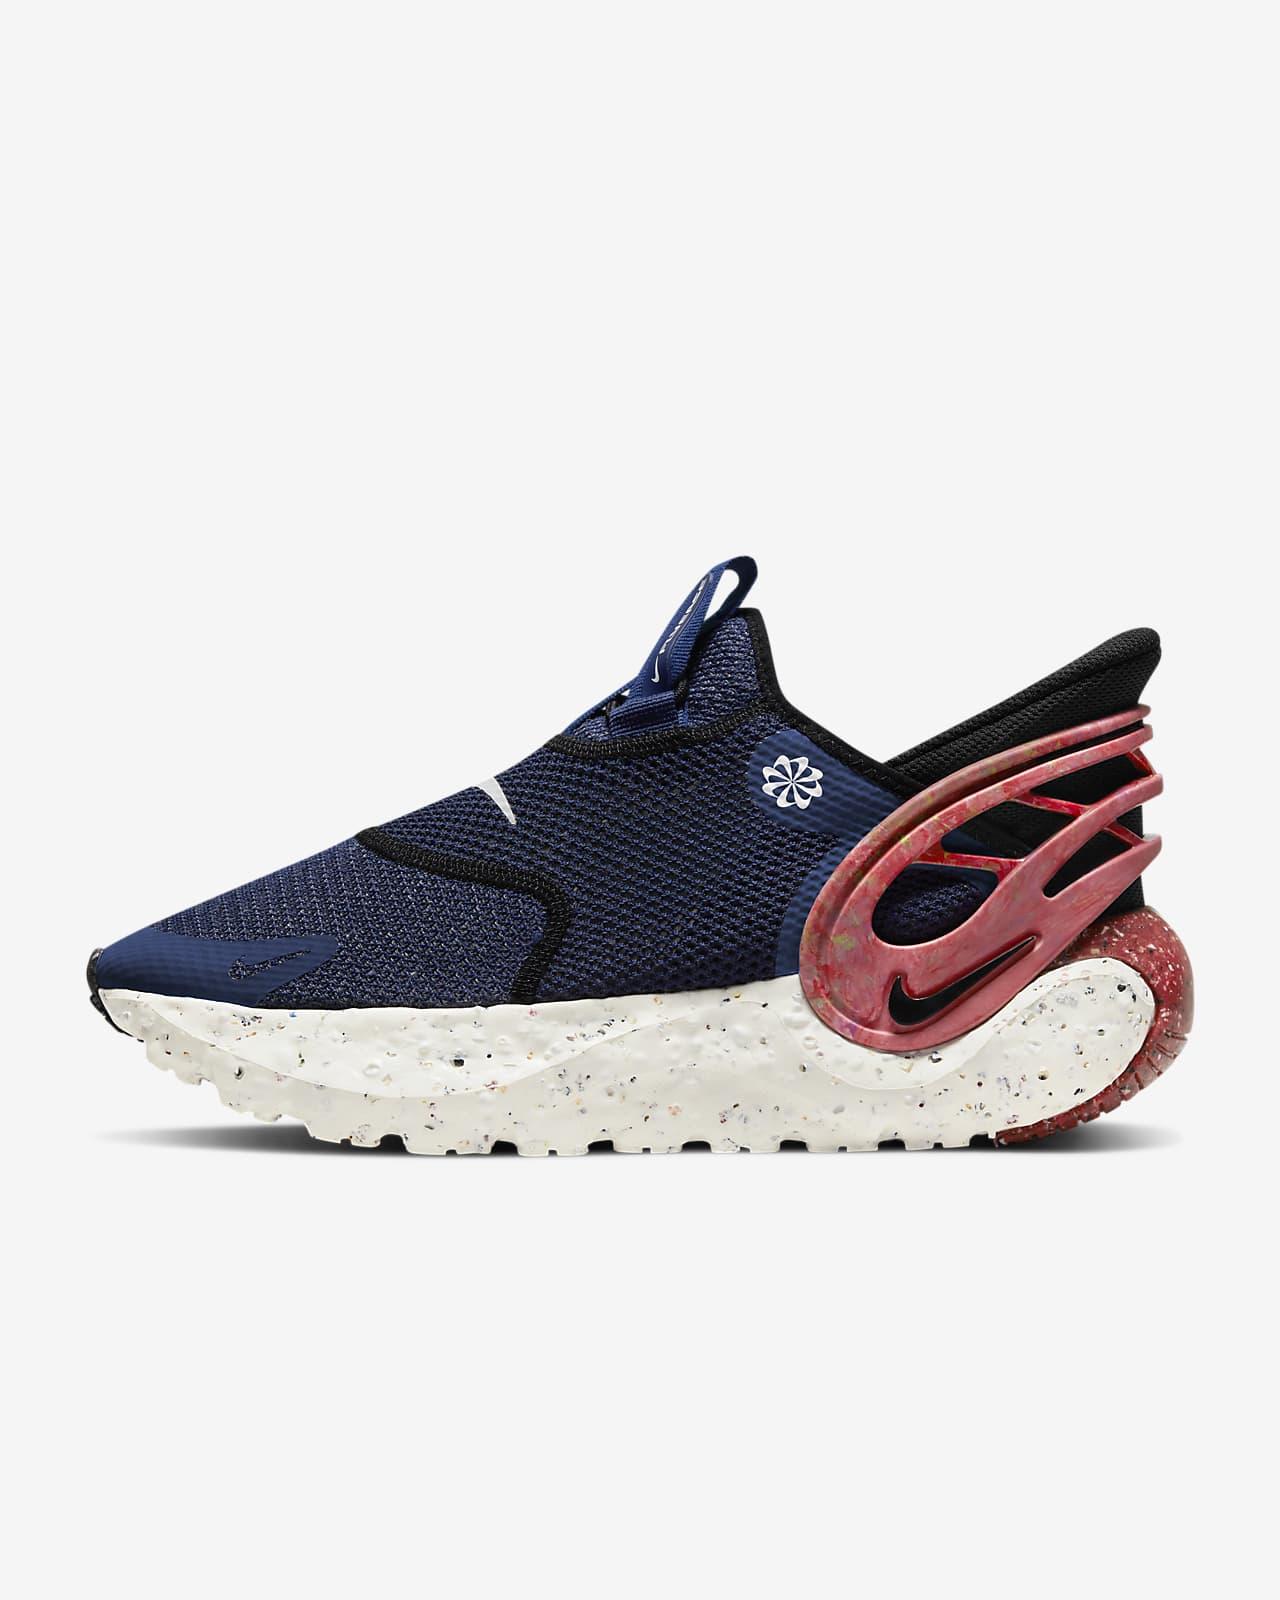 Nike Glide FlyEase Premium Shoe